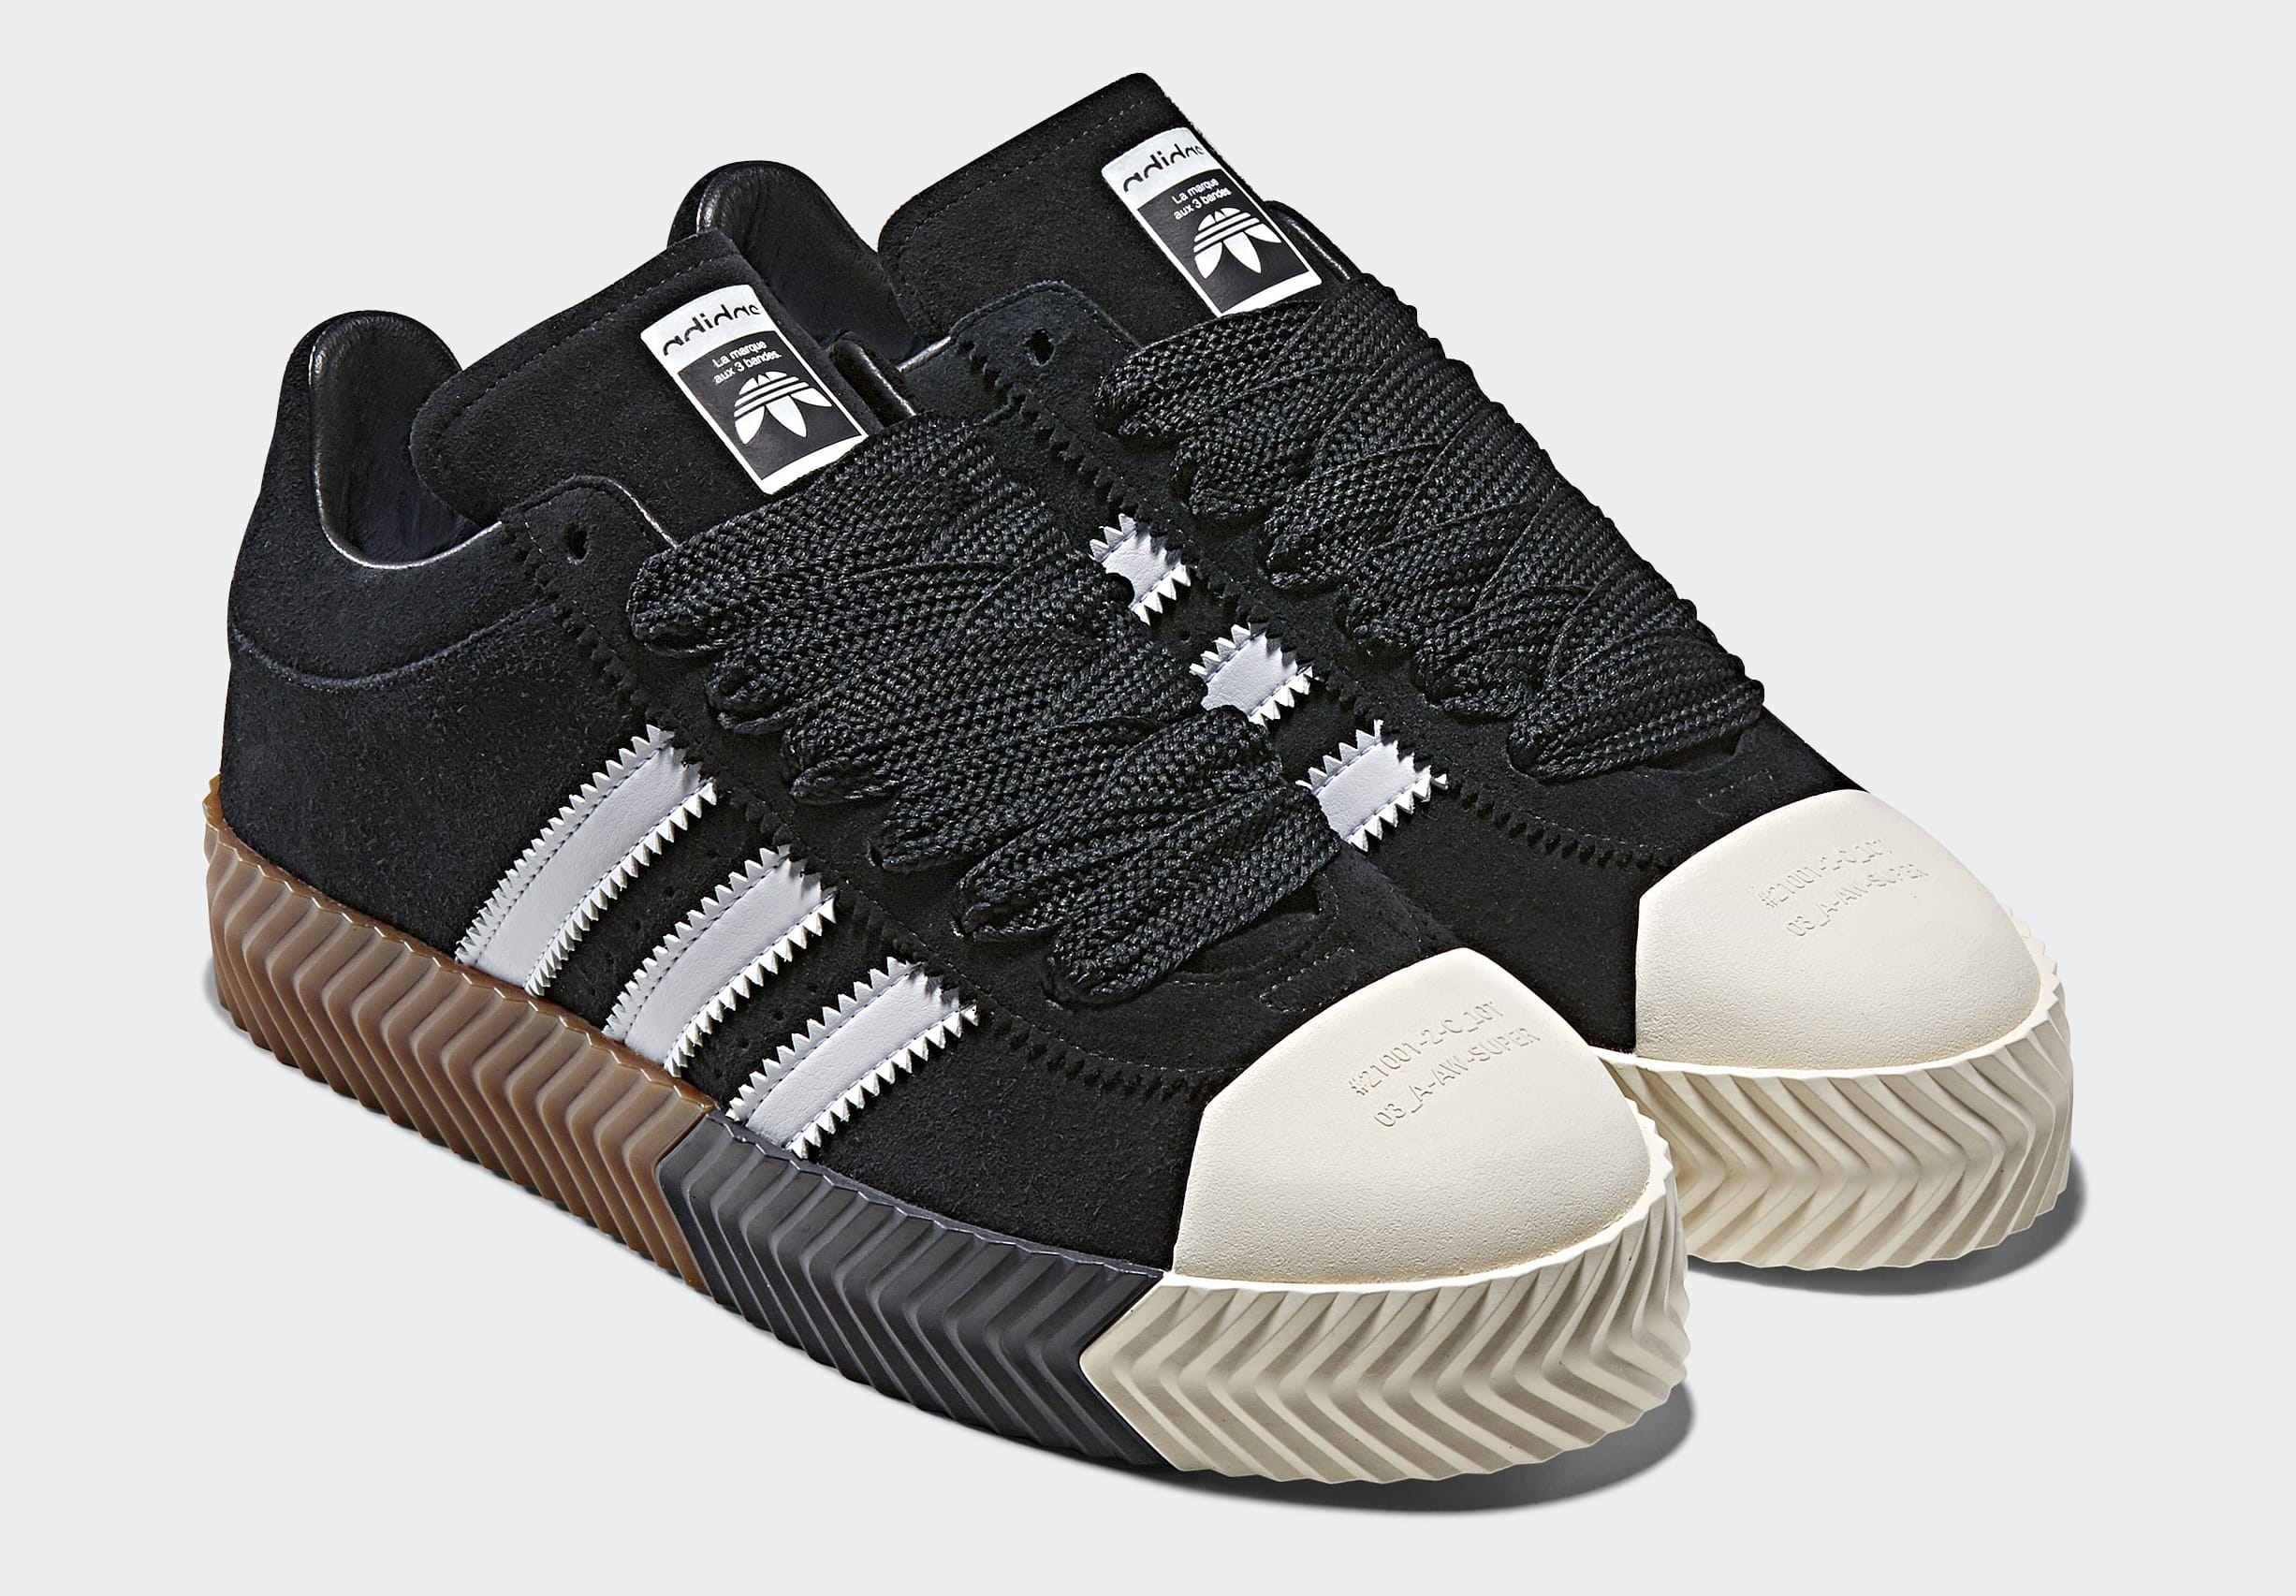 check out c2eb7 1ea4d Adidas Originals by Alexander Wang Fall/Winter 2018 ...